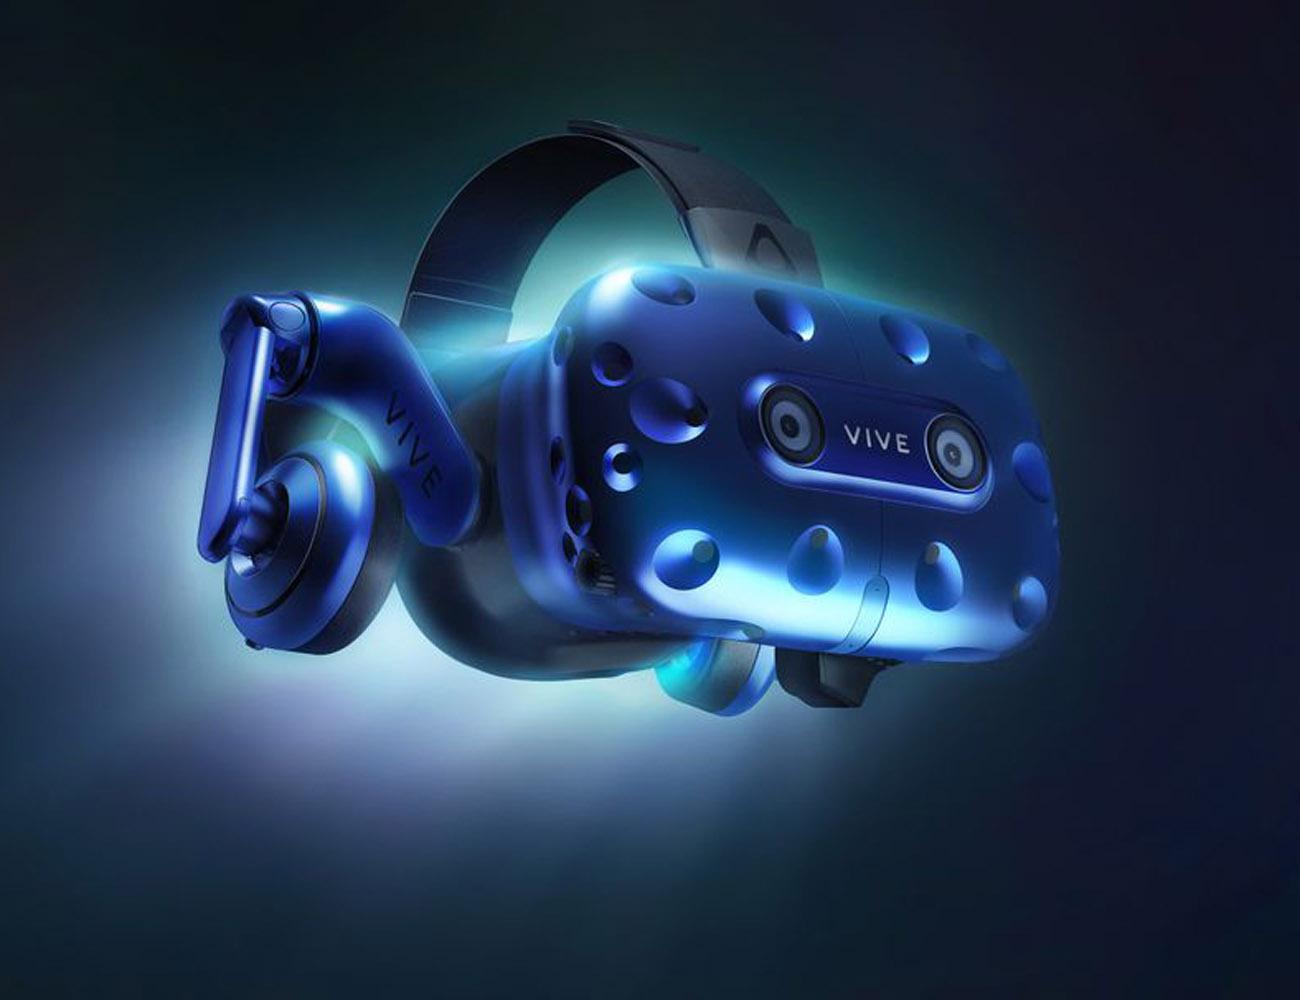 New+HTC+Vive+Pro+Virtual+Reality+Headset